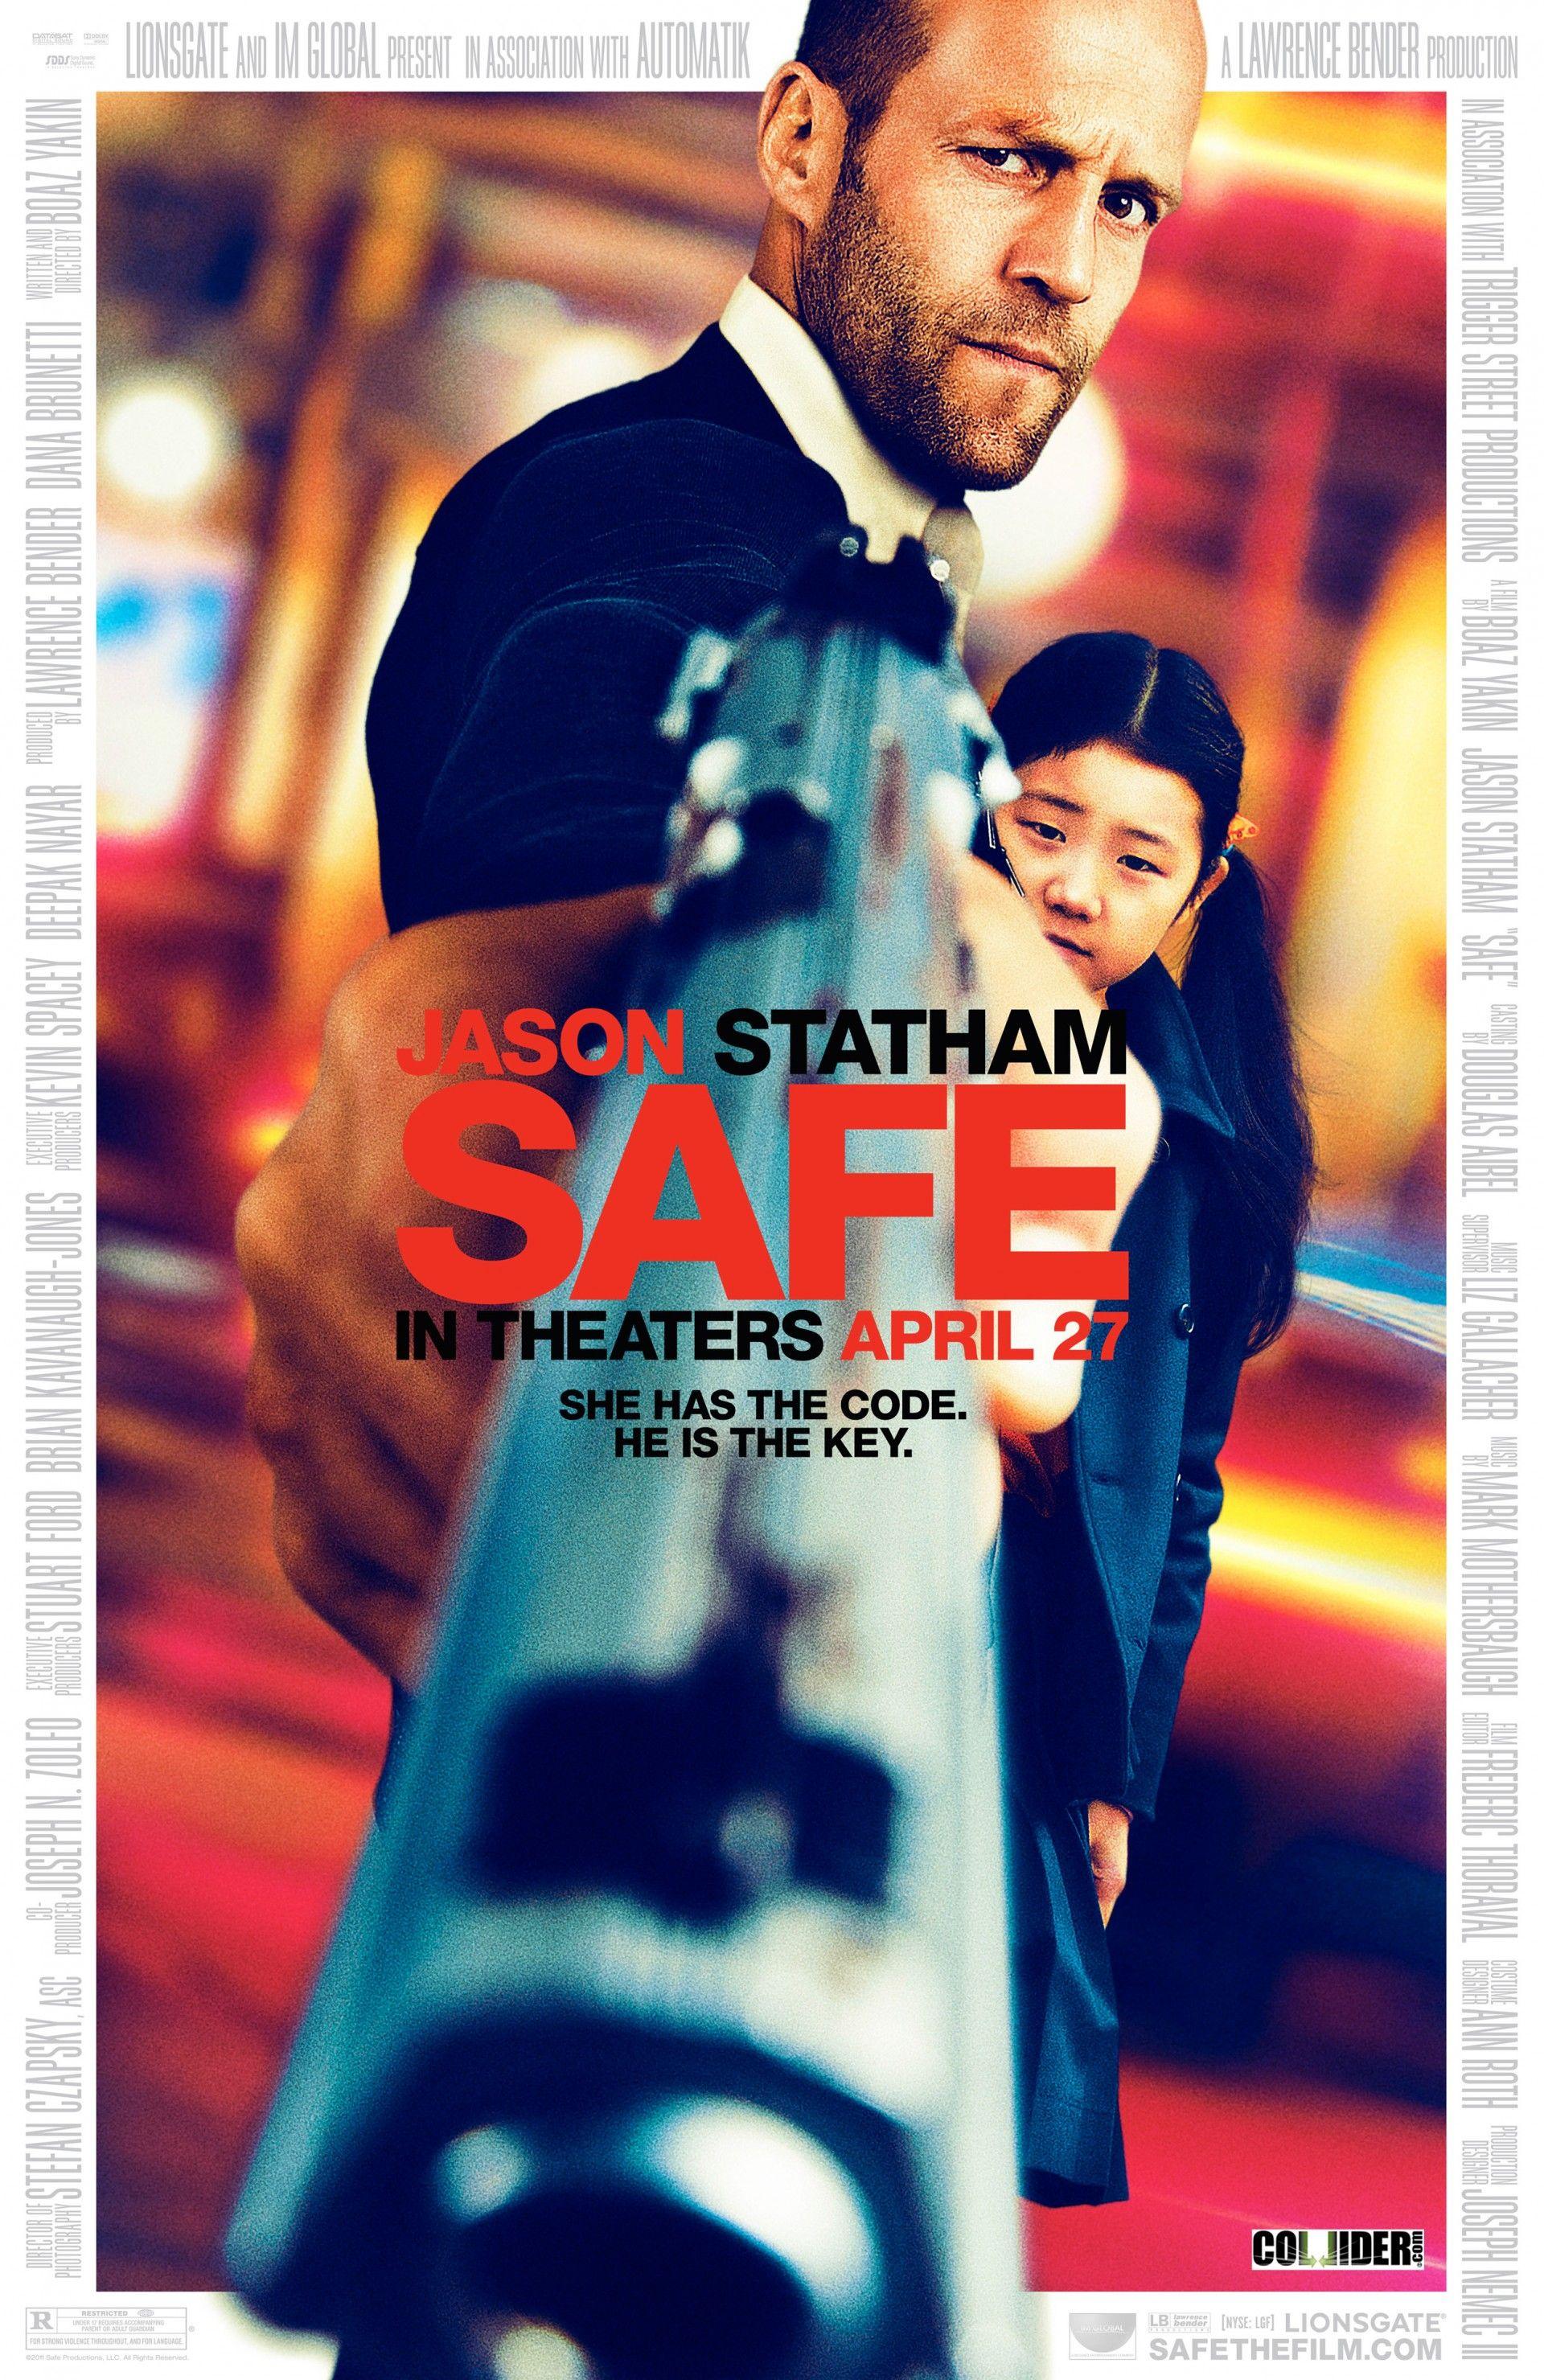 Safe 2012 Jason Statham Movies New Movie Posters Statham